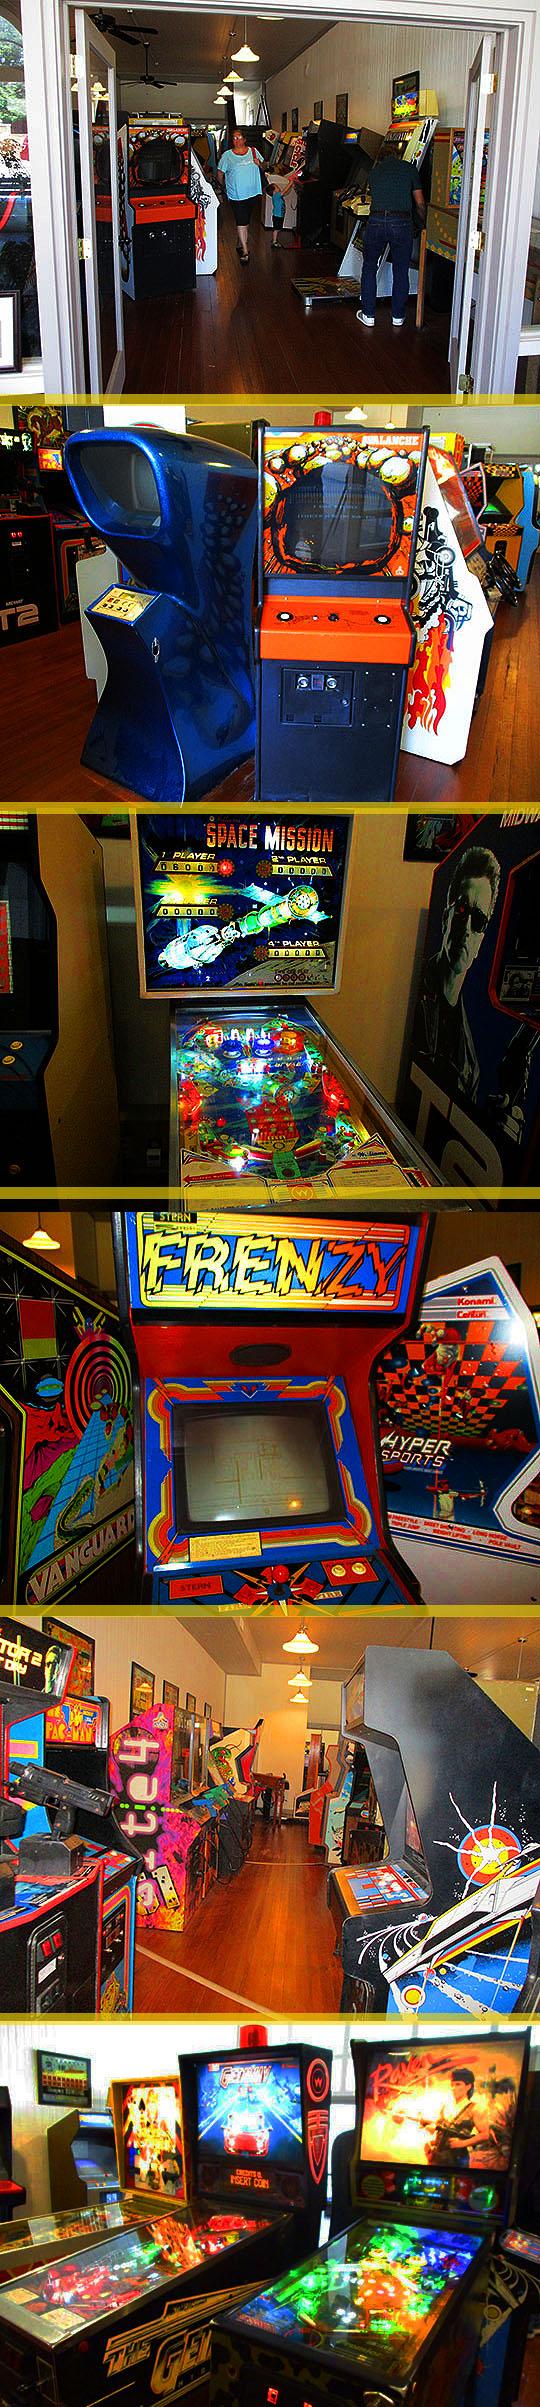 12. arcade_8-6-19.jpg